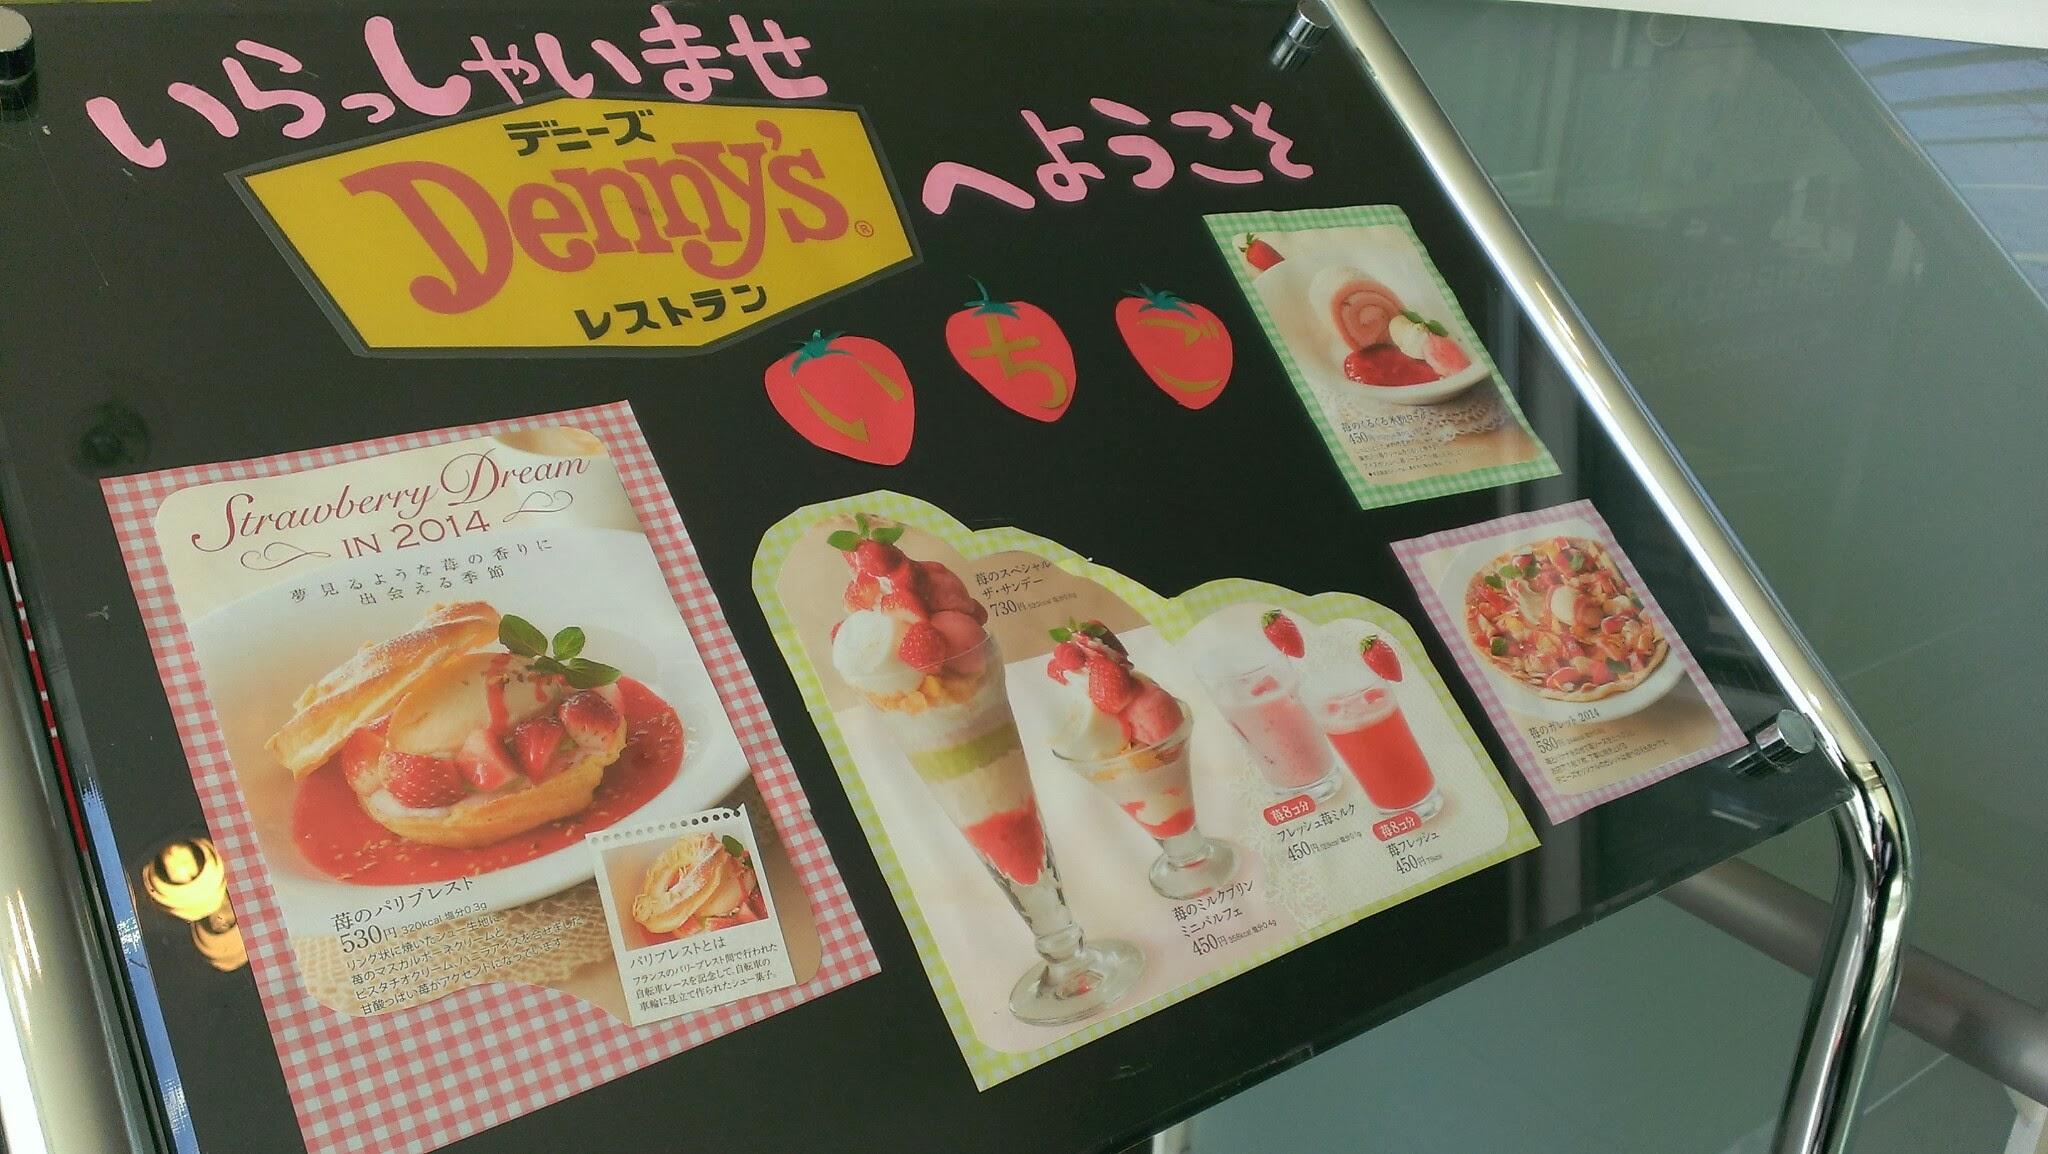 Denny's for Basics and Brunch